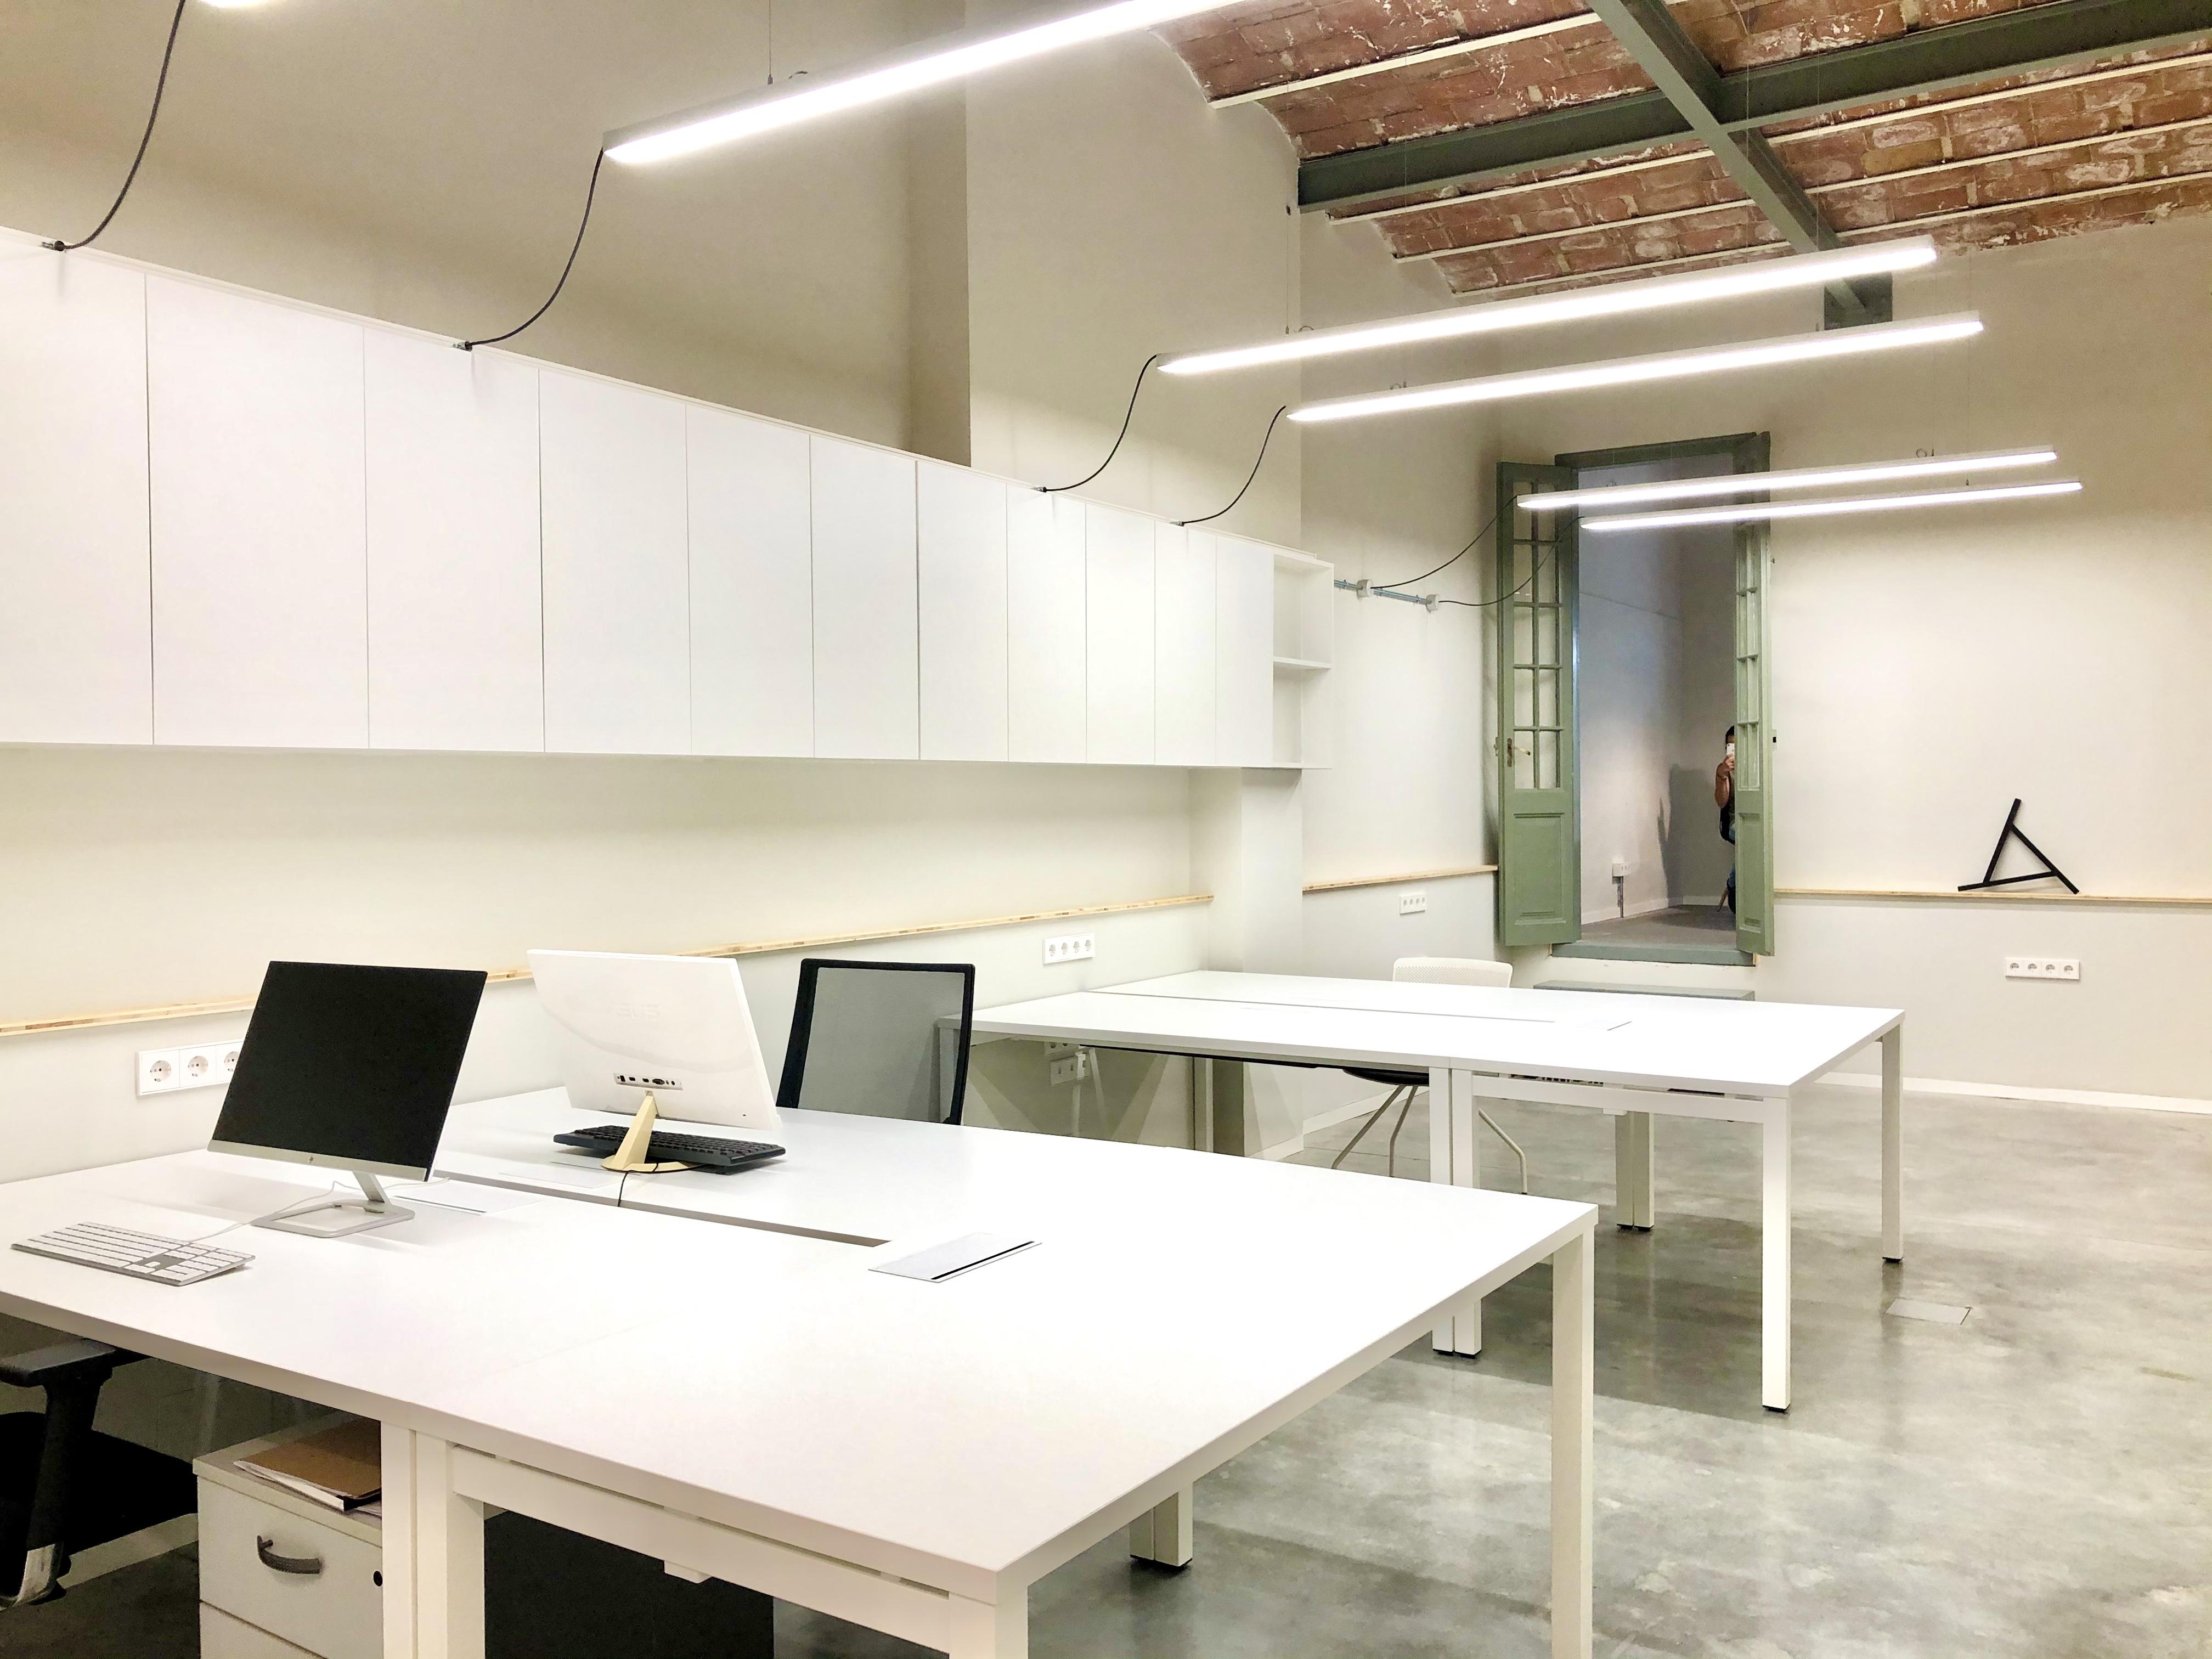 Arquivistes office 3